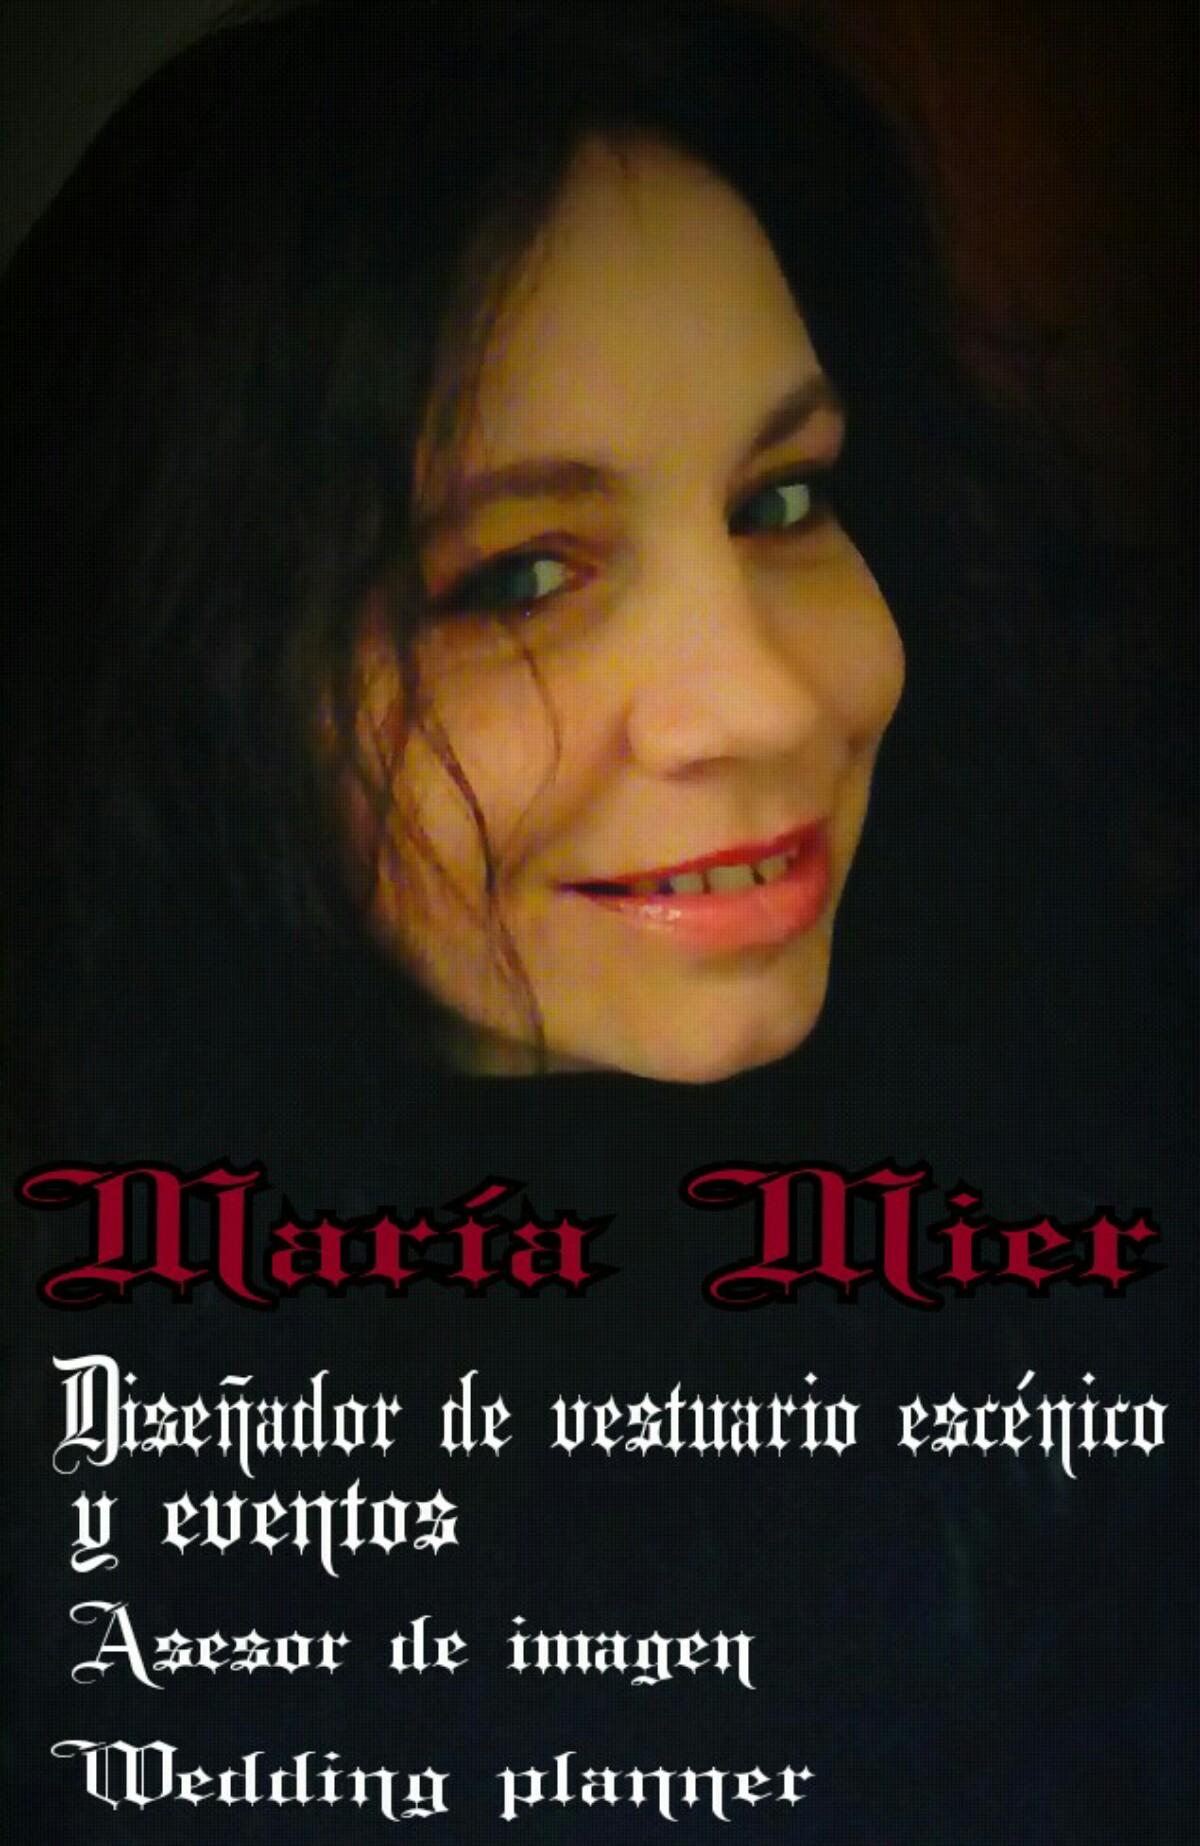 María Mier